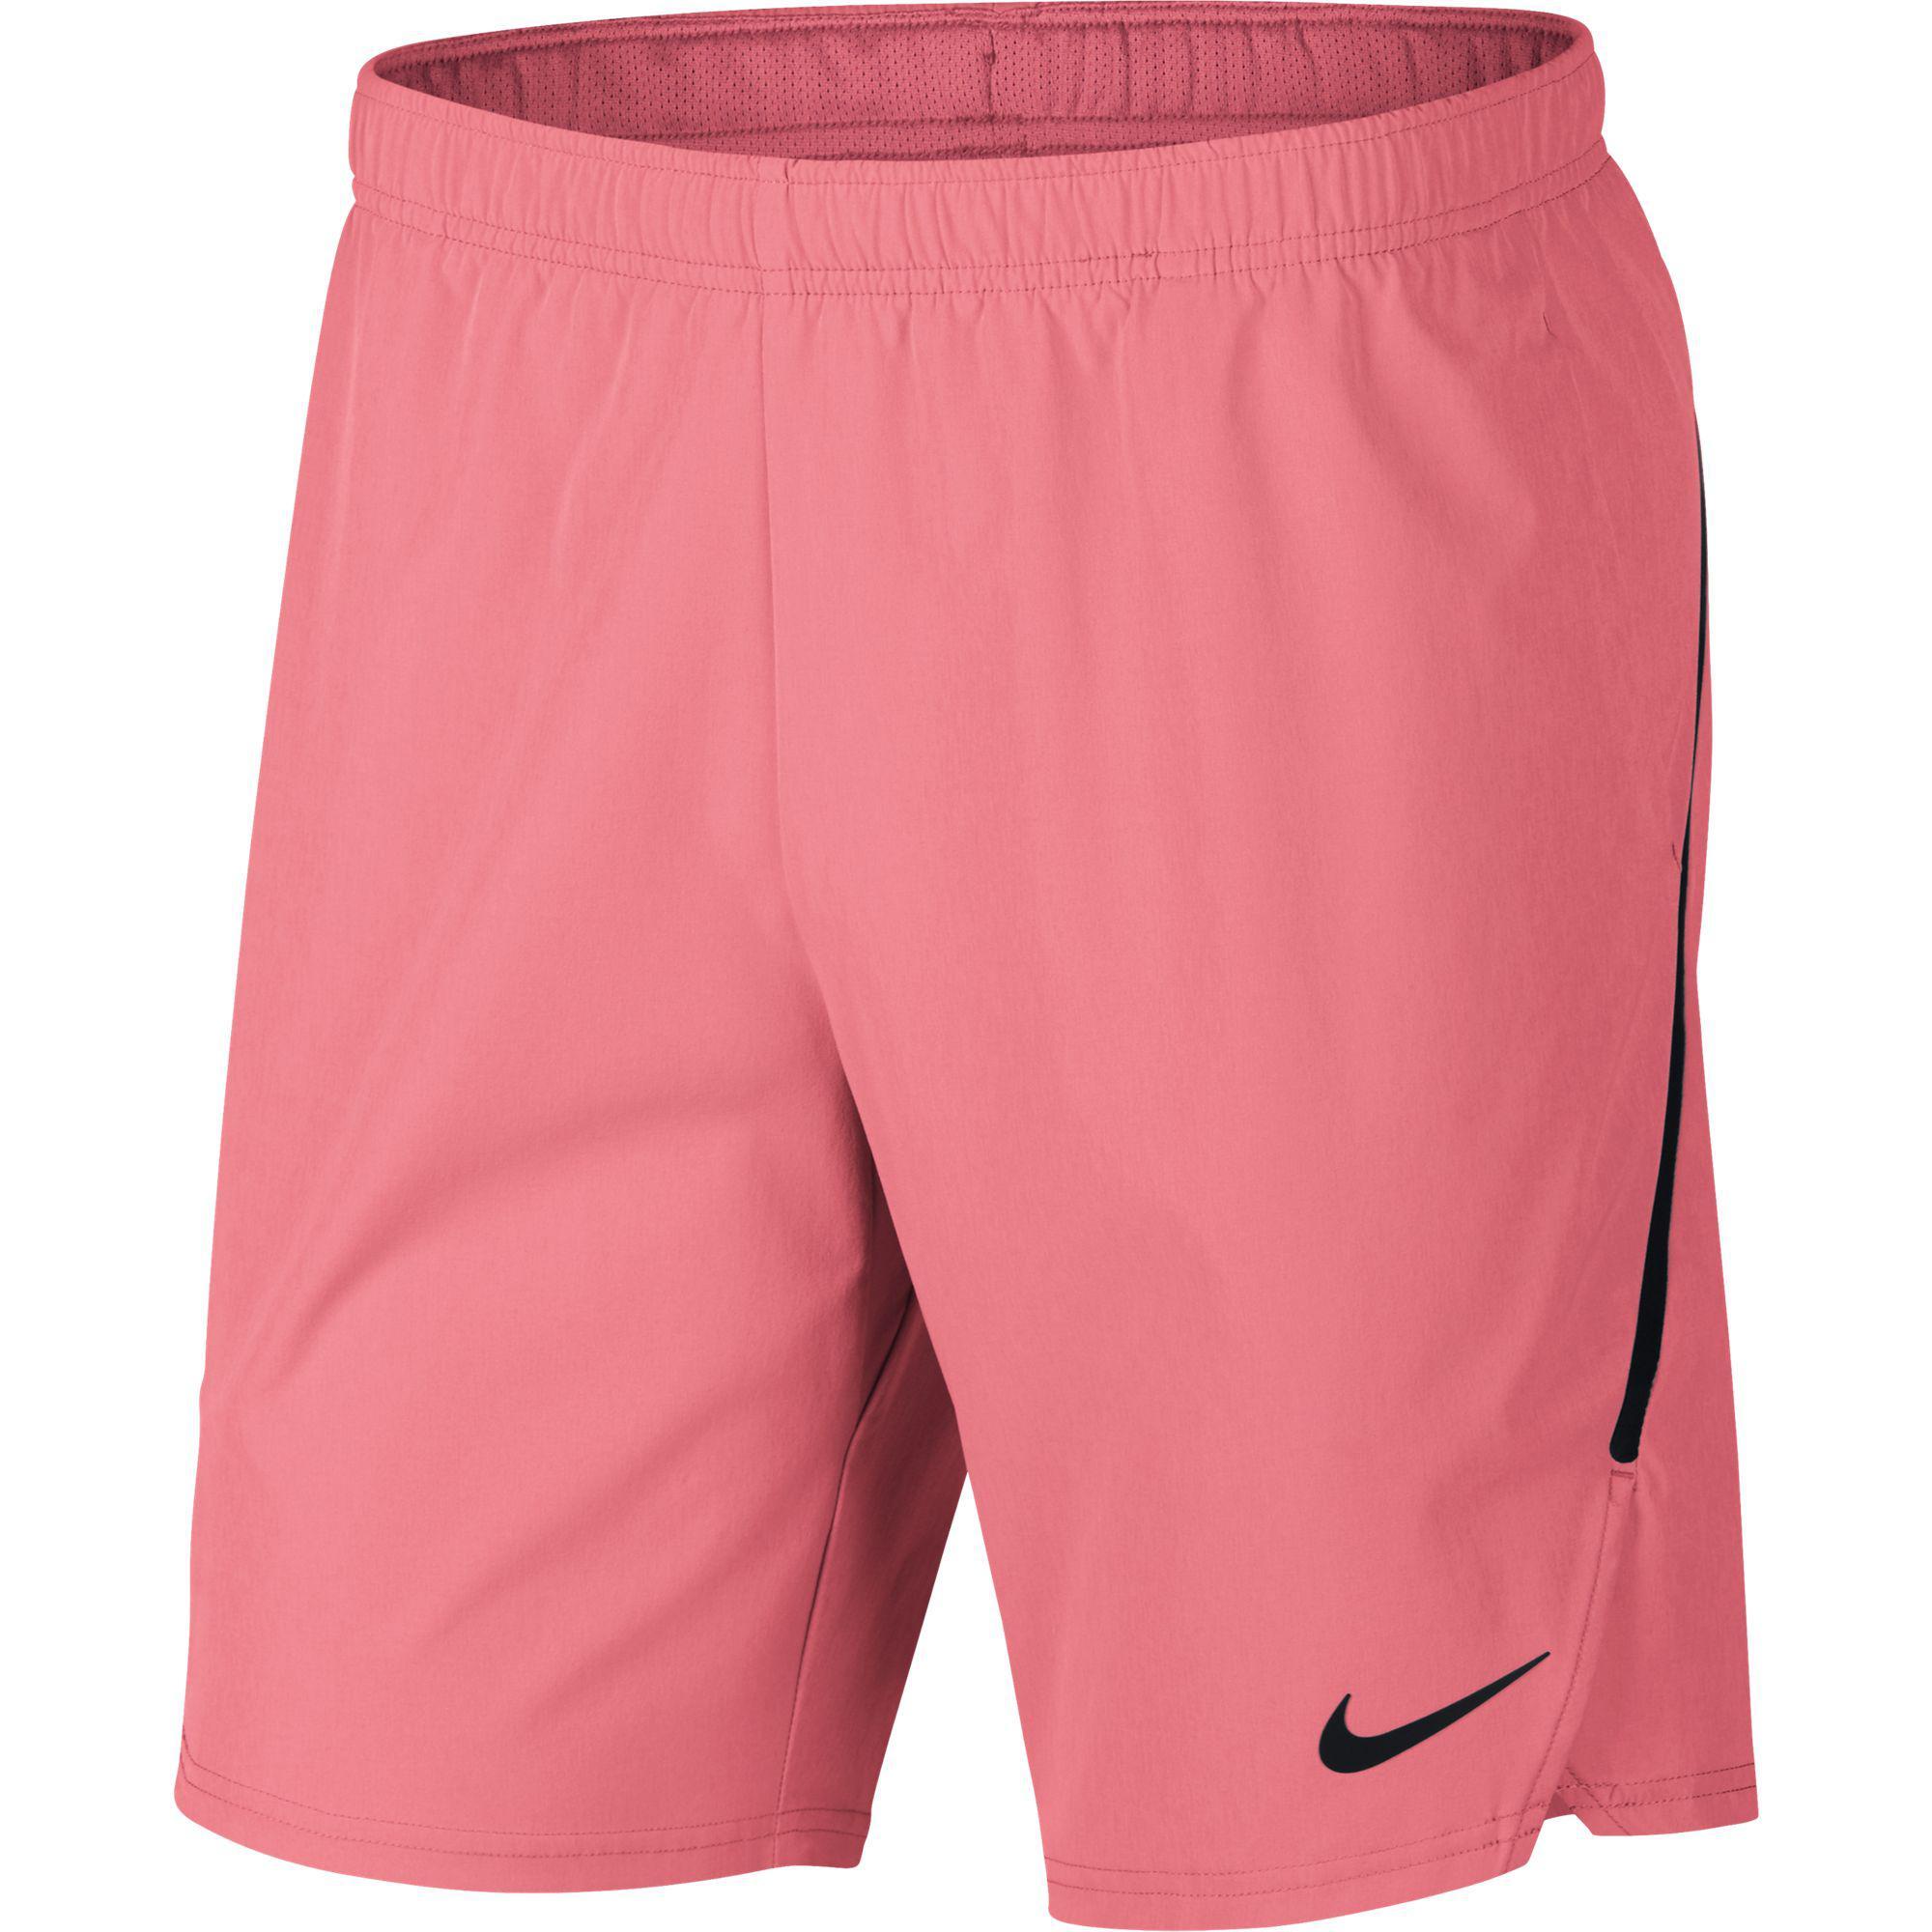 hot sales 1642b c2ed3 Nike Mens Flex Ace 9 Inch Shorts - Lava Glow Black - Tennisnuts.com